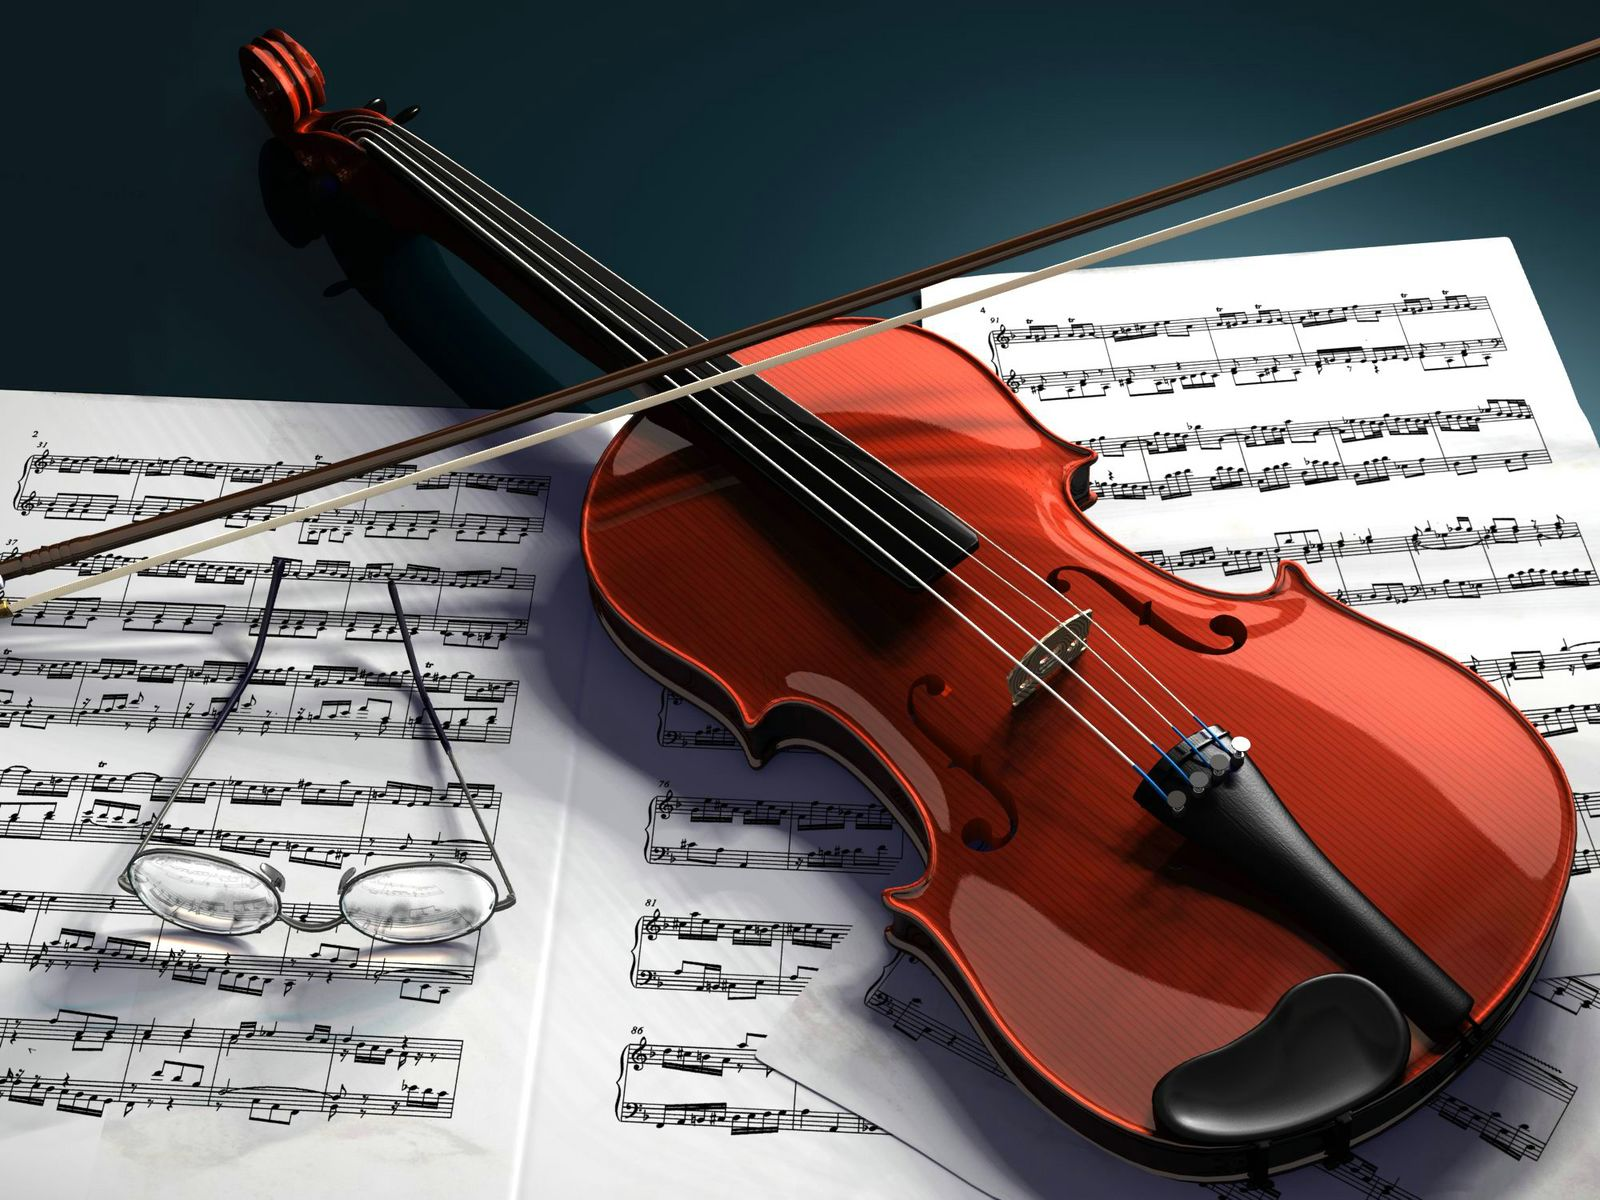 Violin Latest HD Wallpapers   Best HD Desktop Wallpapers